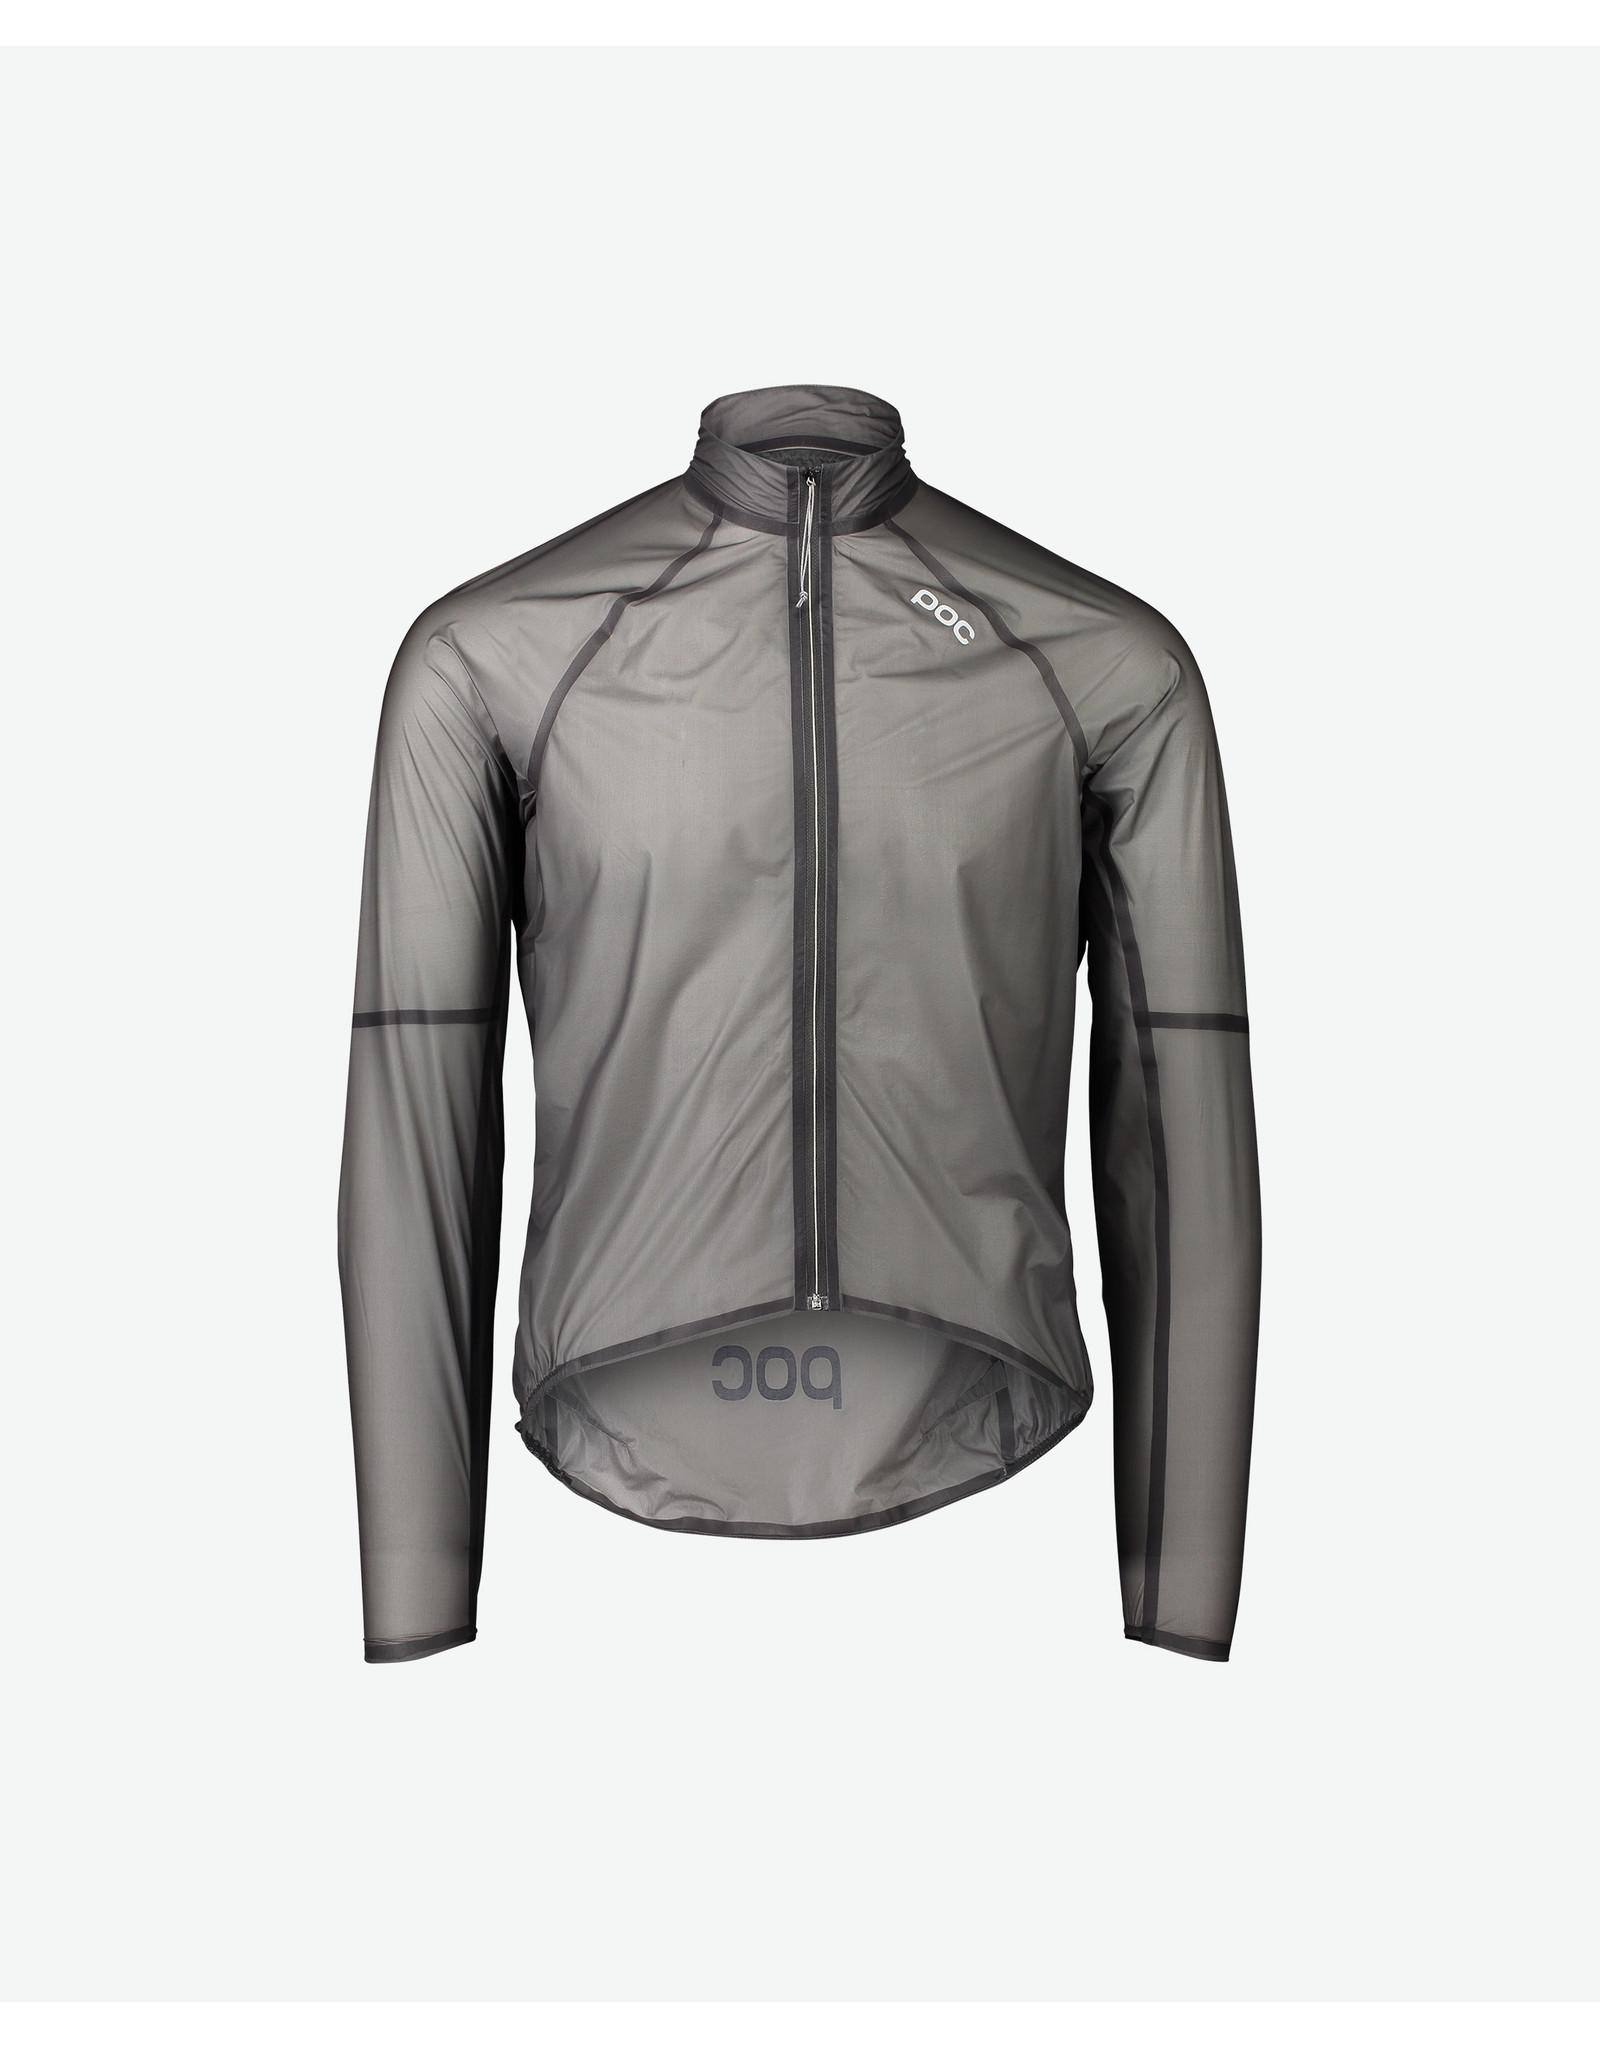 POC POC The Supreme Rain Jacket